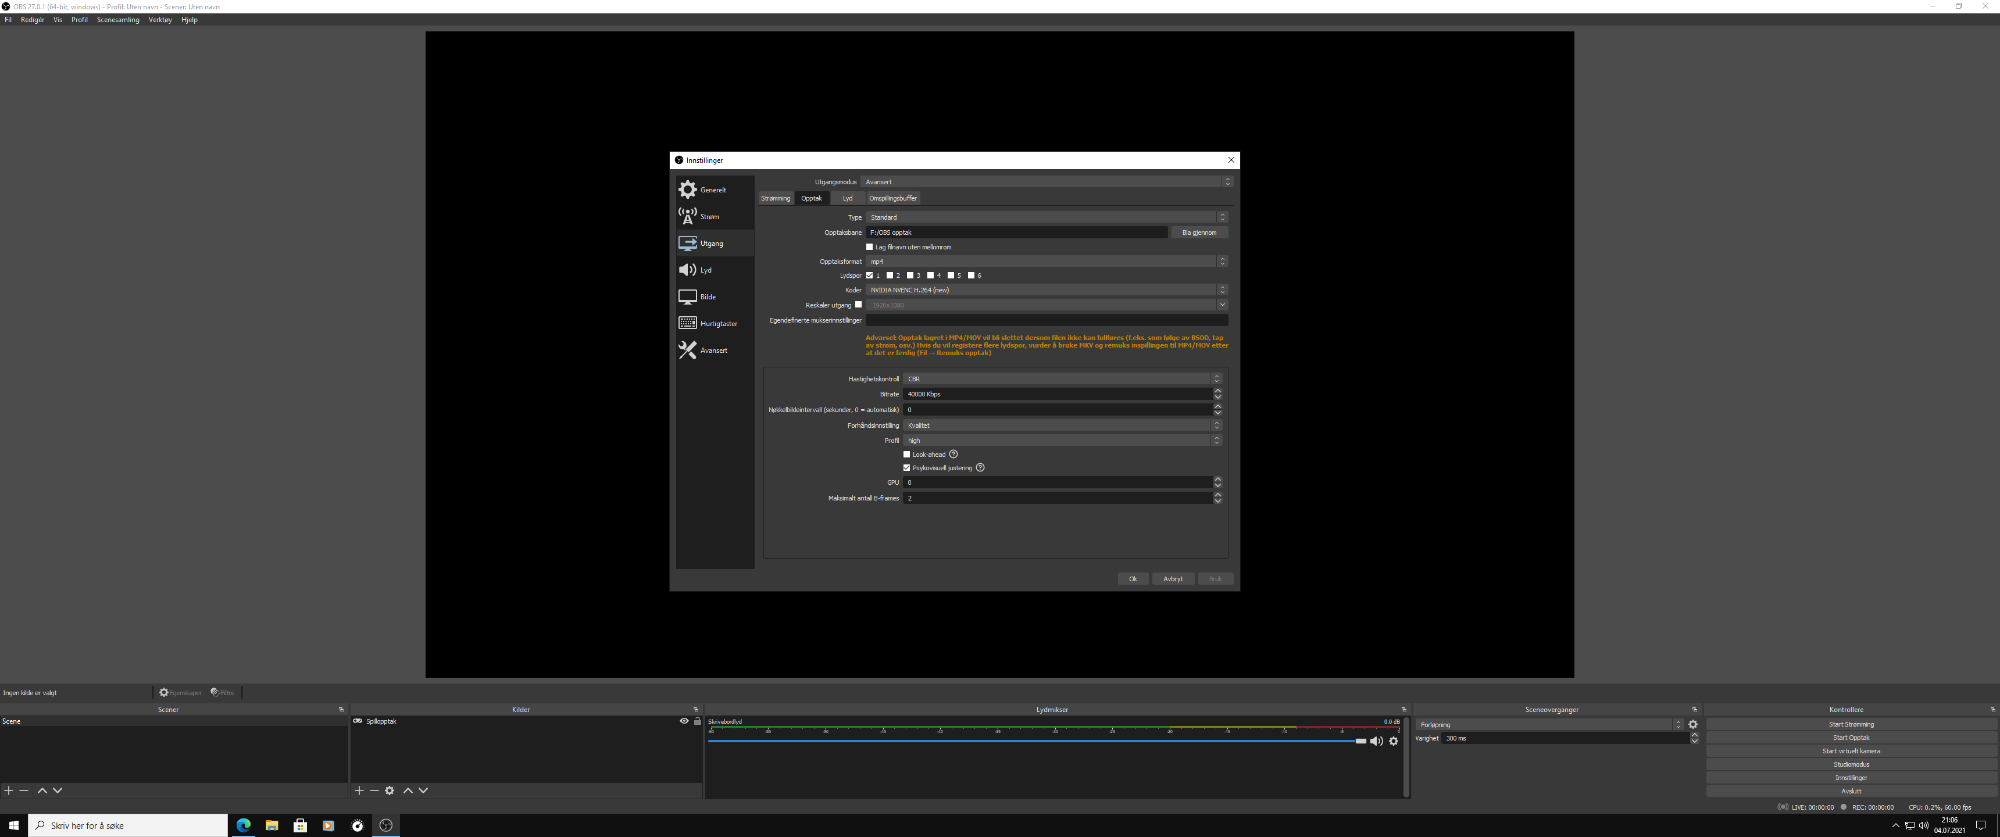 Desktop Screenshot 2021.07.04 - 21.06.54.73.png